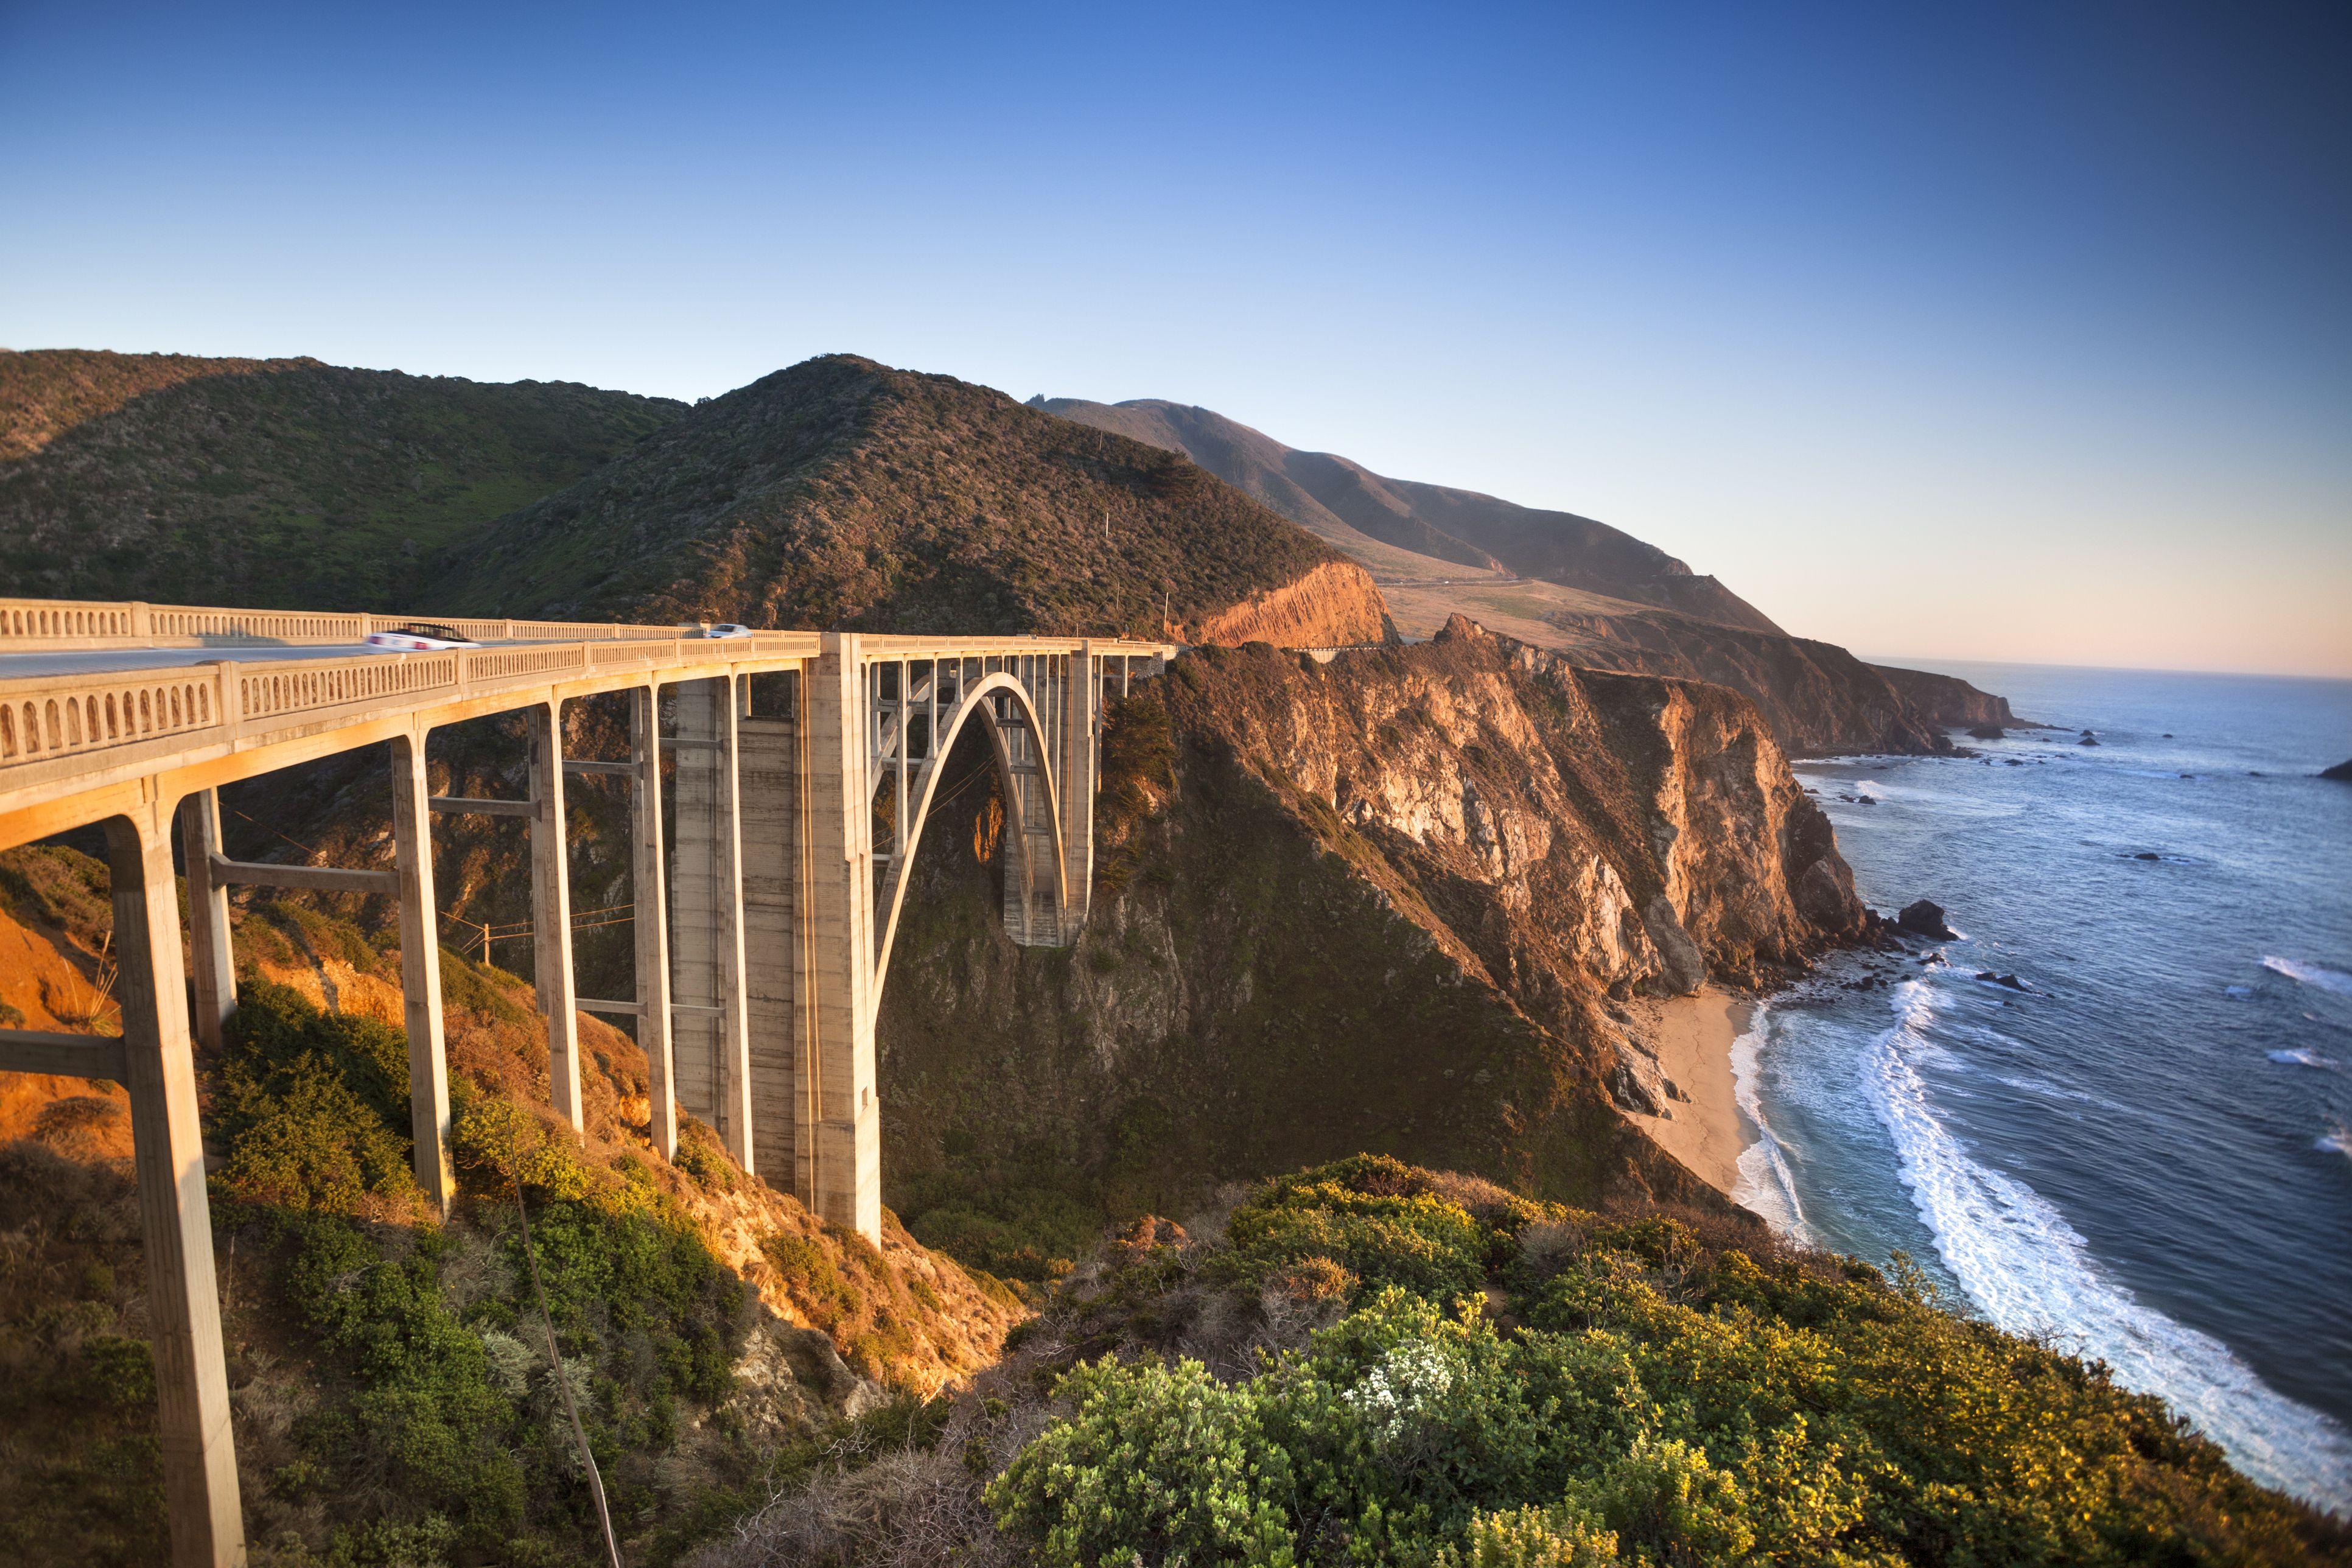 фото юга калифорнии постепенно